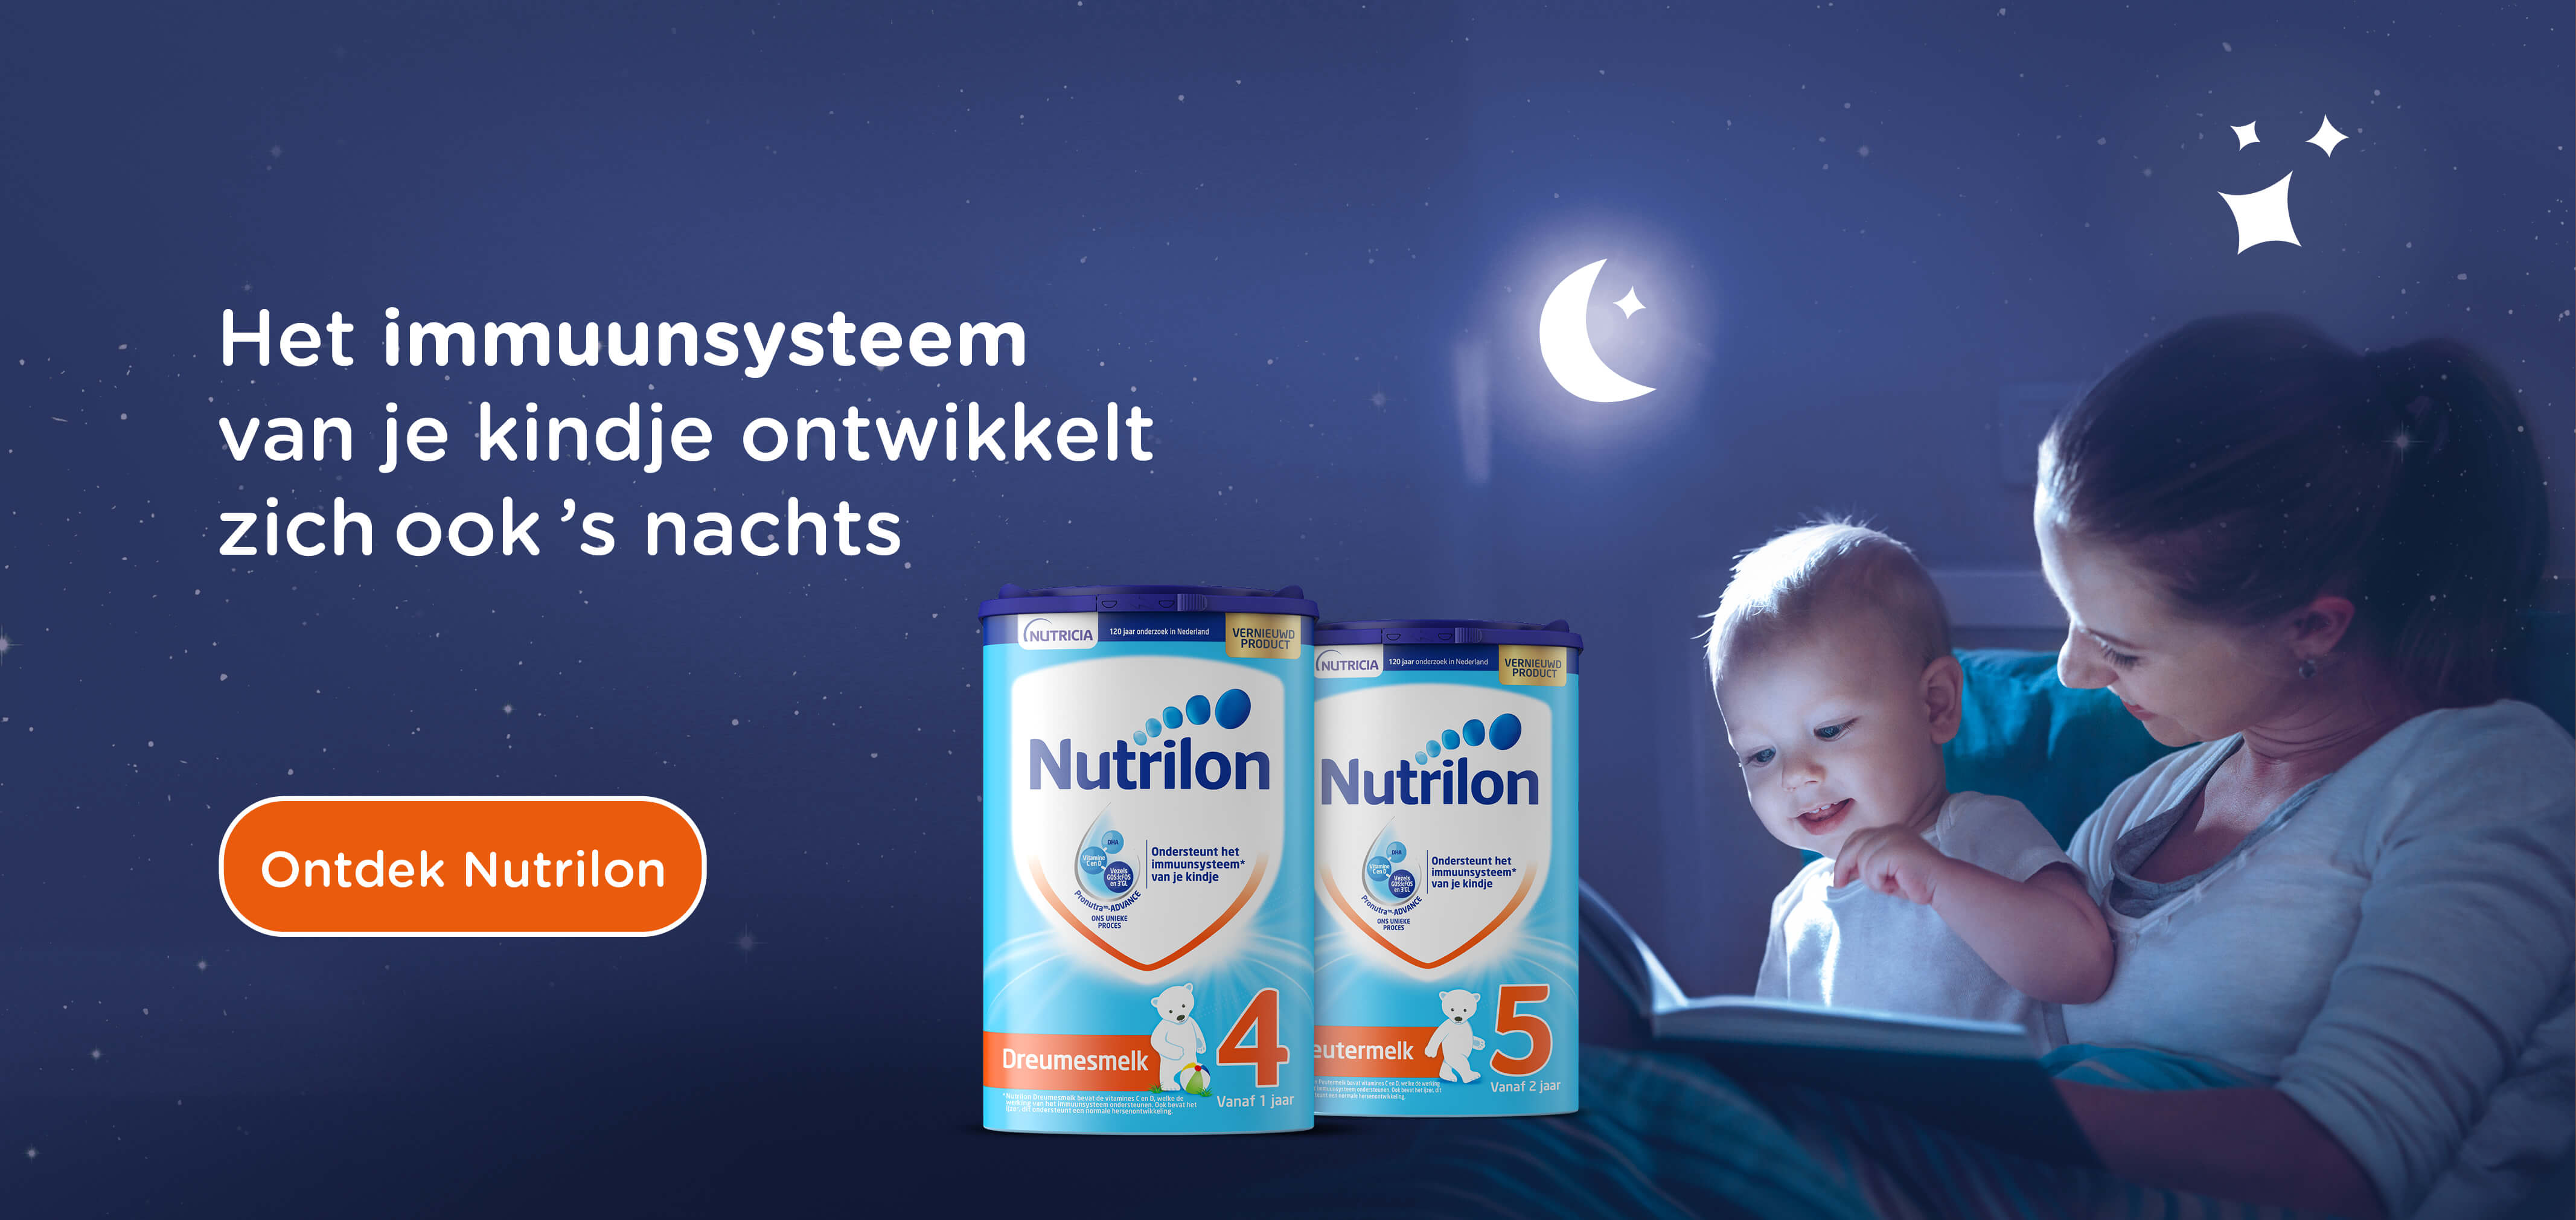 Nutrilon dreumesmelk en peutermelk